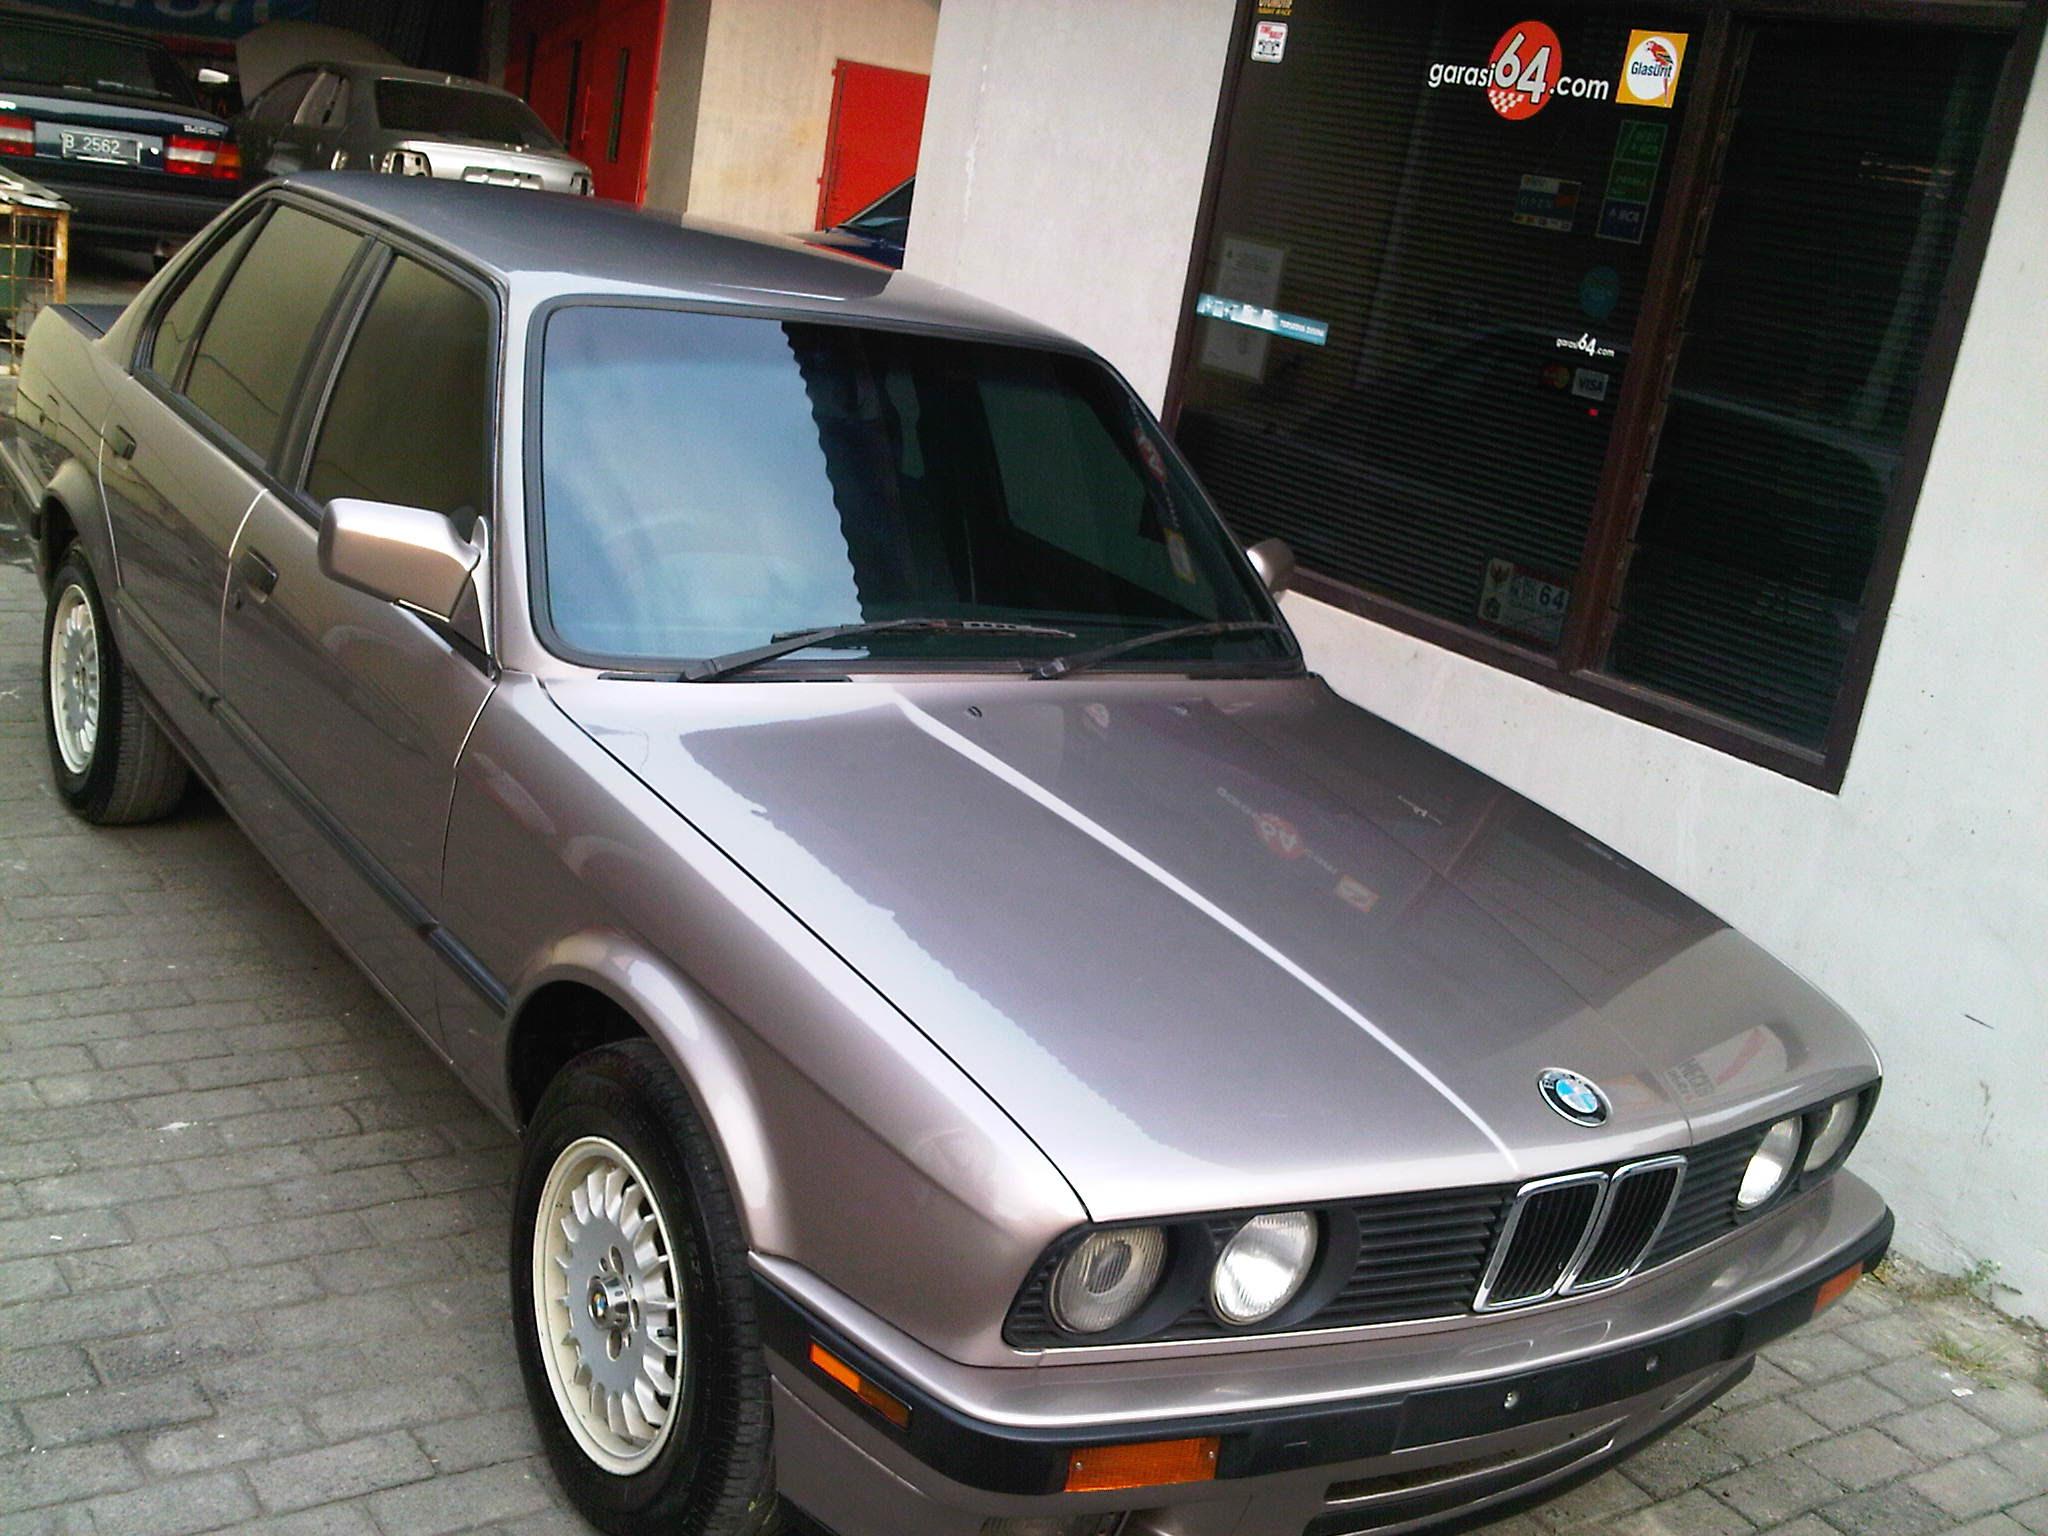 5 Daftar Harga Mobil Sedan Bekas 50 jt an atau di bawahnya ...